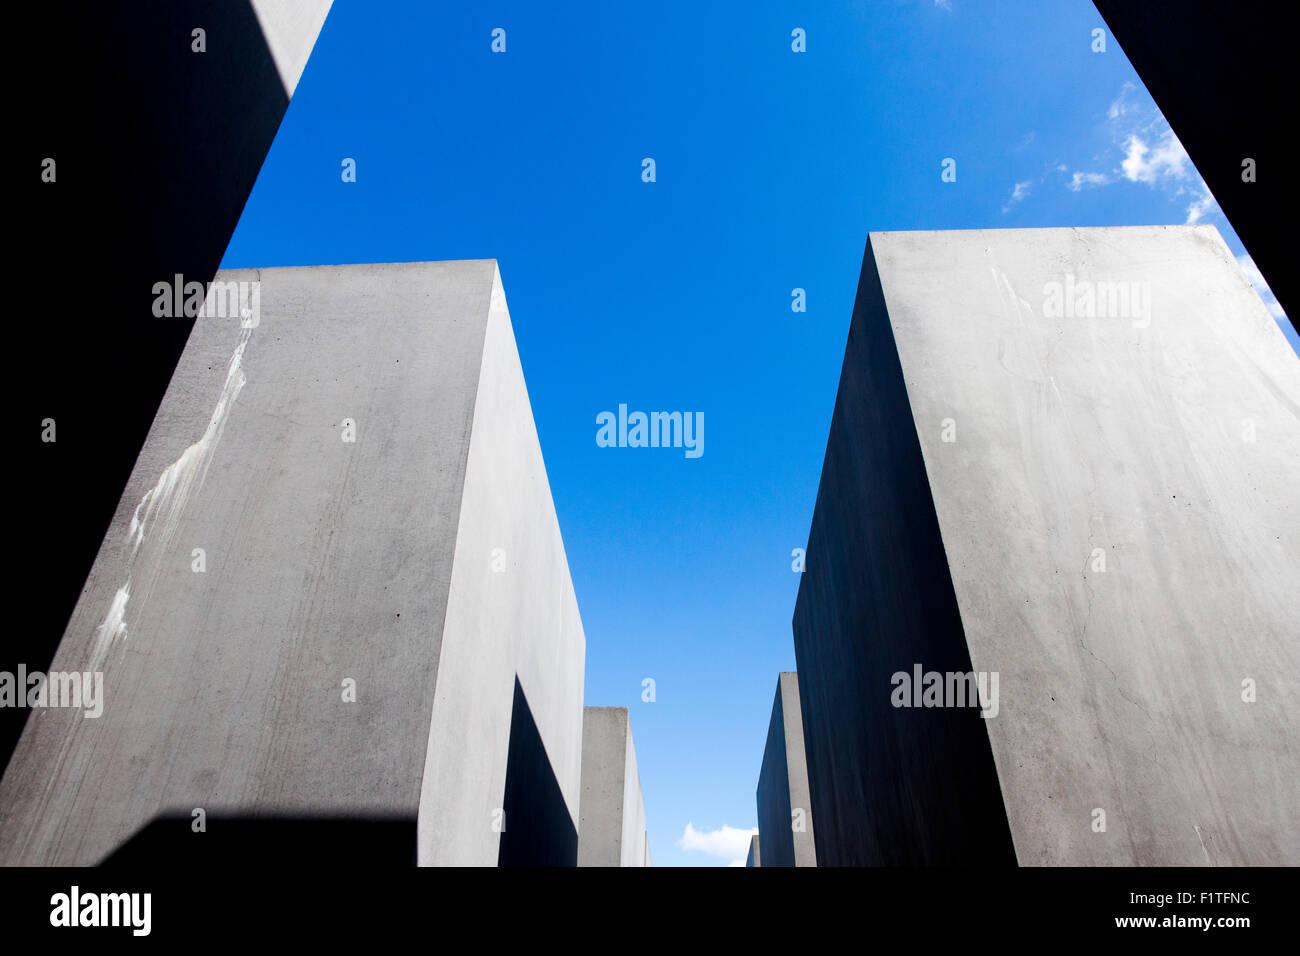 Berlin , Germany. The Memorial to the Murdered Jews of Europe (Denkmal für die ermordeten Juden Europas) - Stock Image